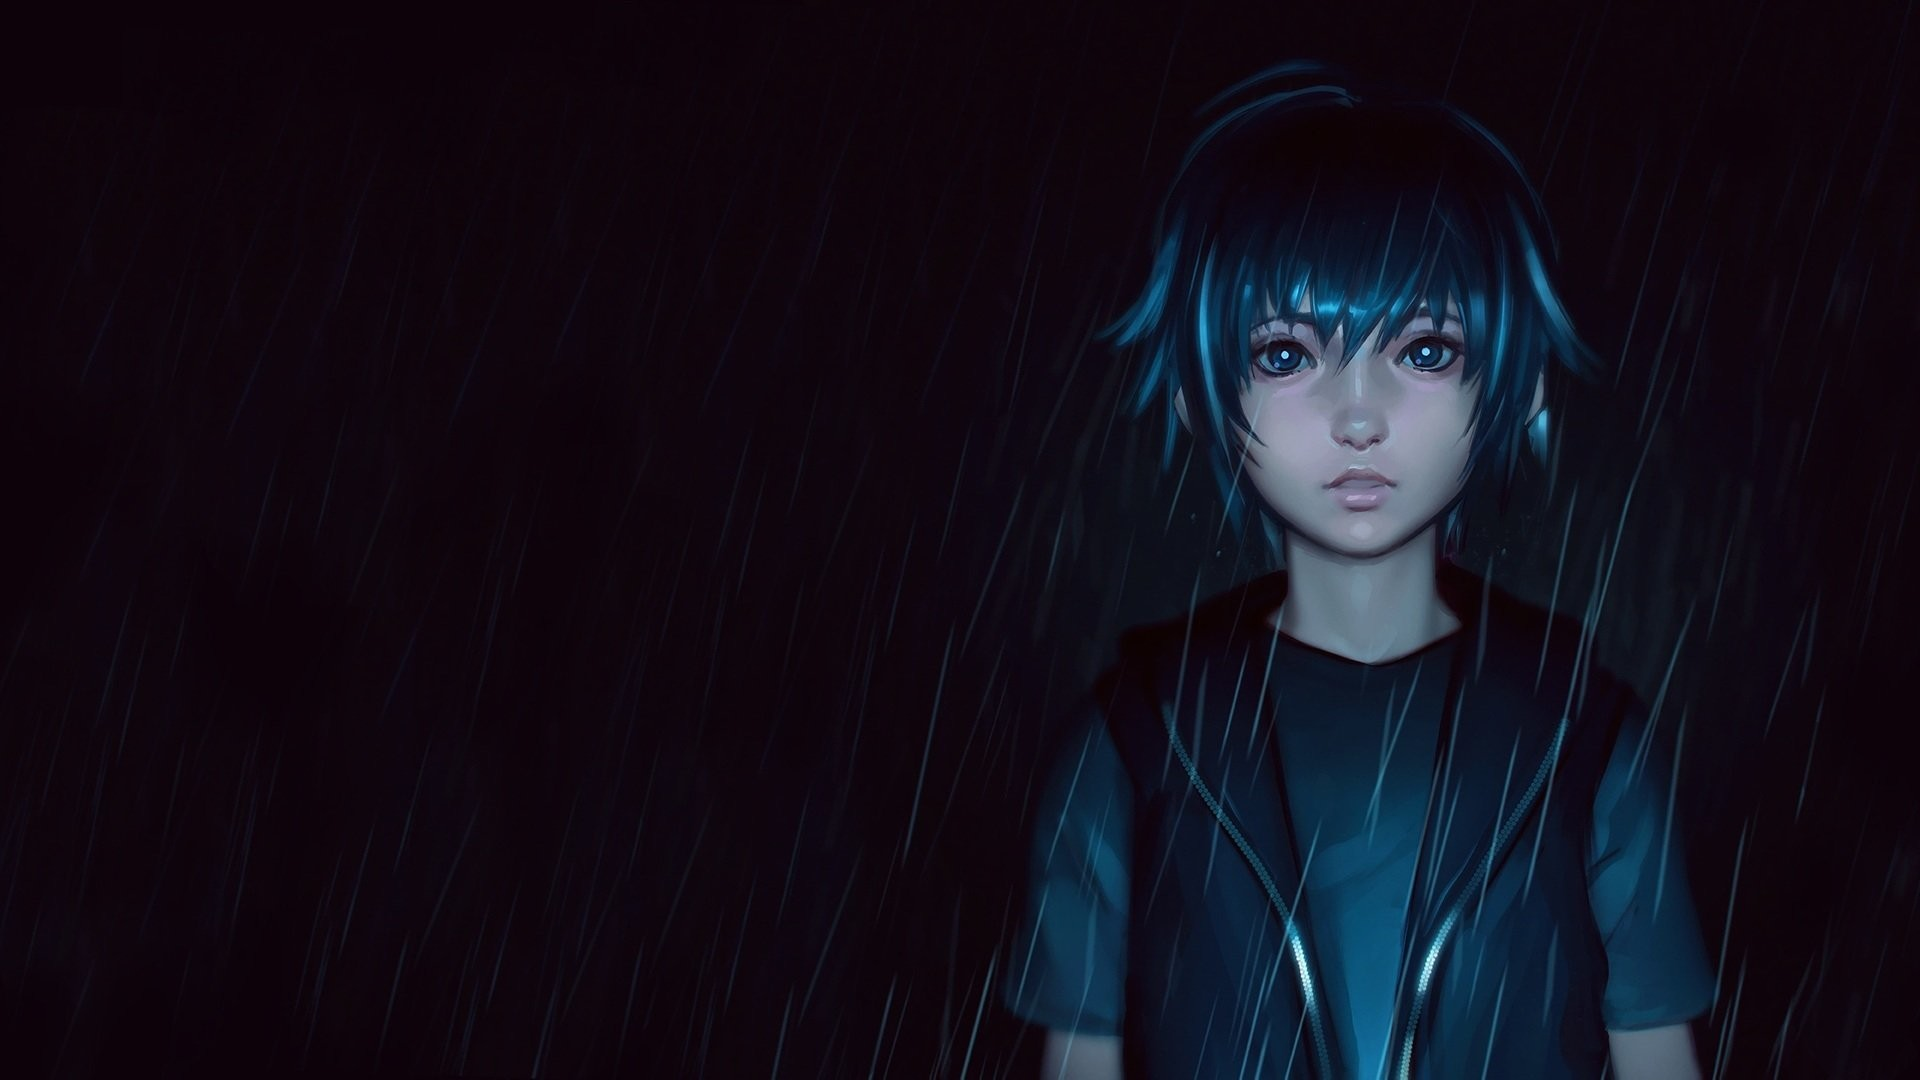 Video Game – Final Fantasy XV Bakgrund